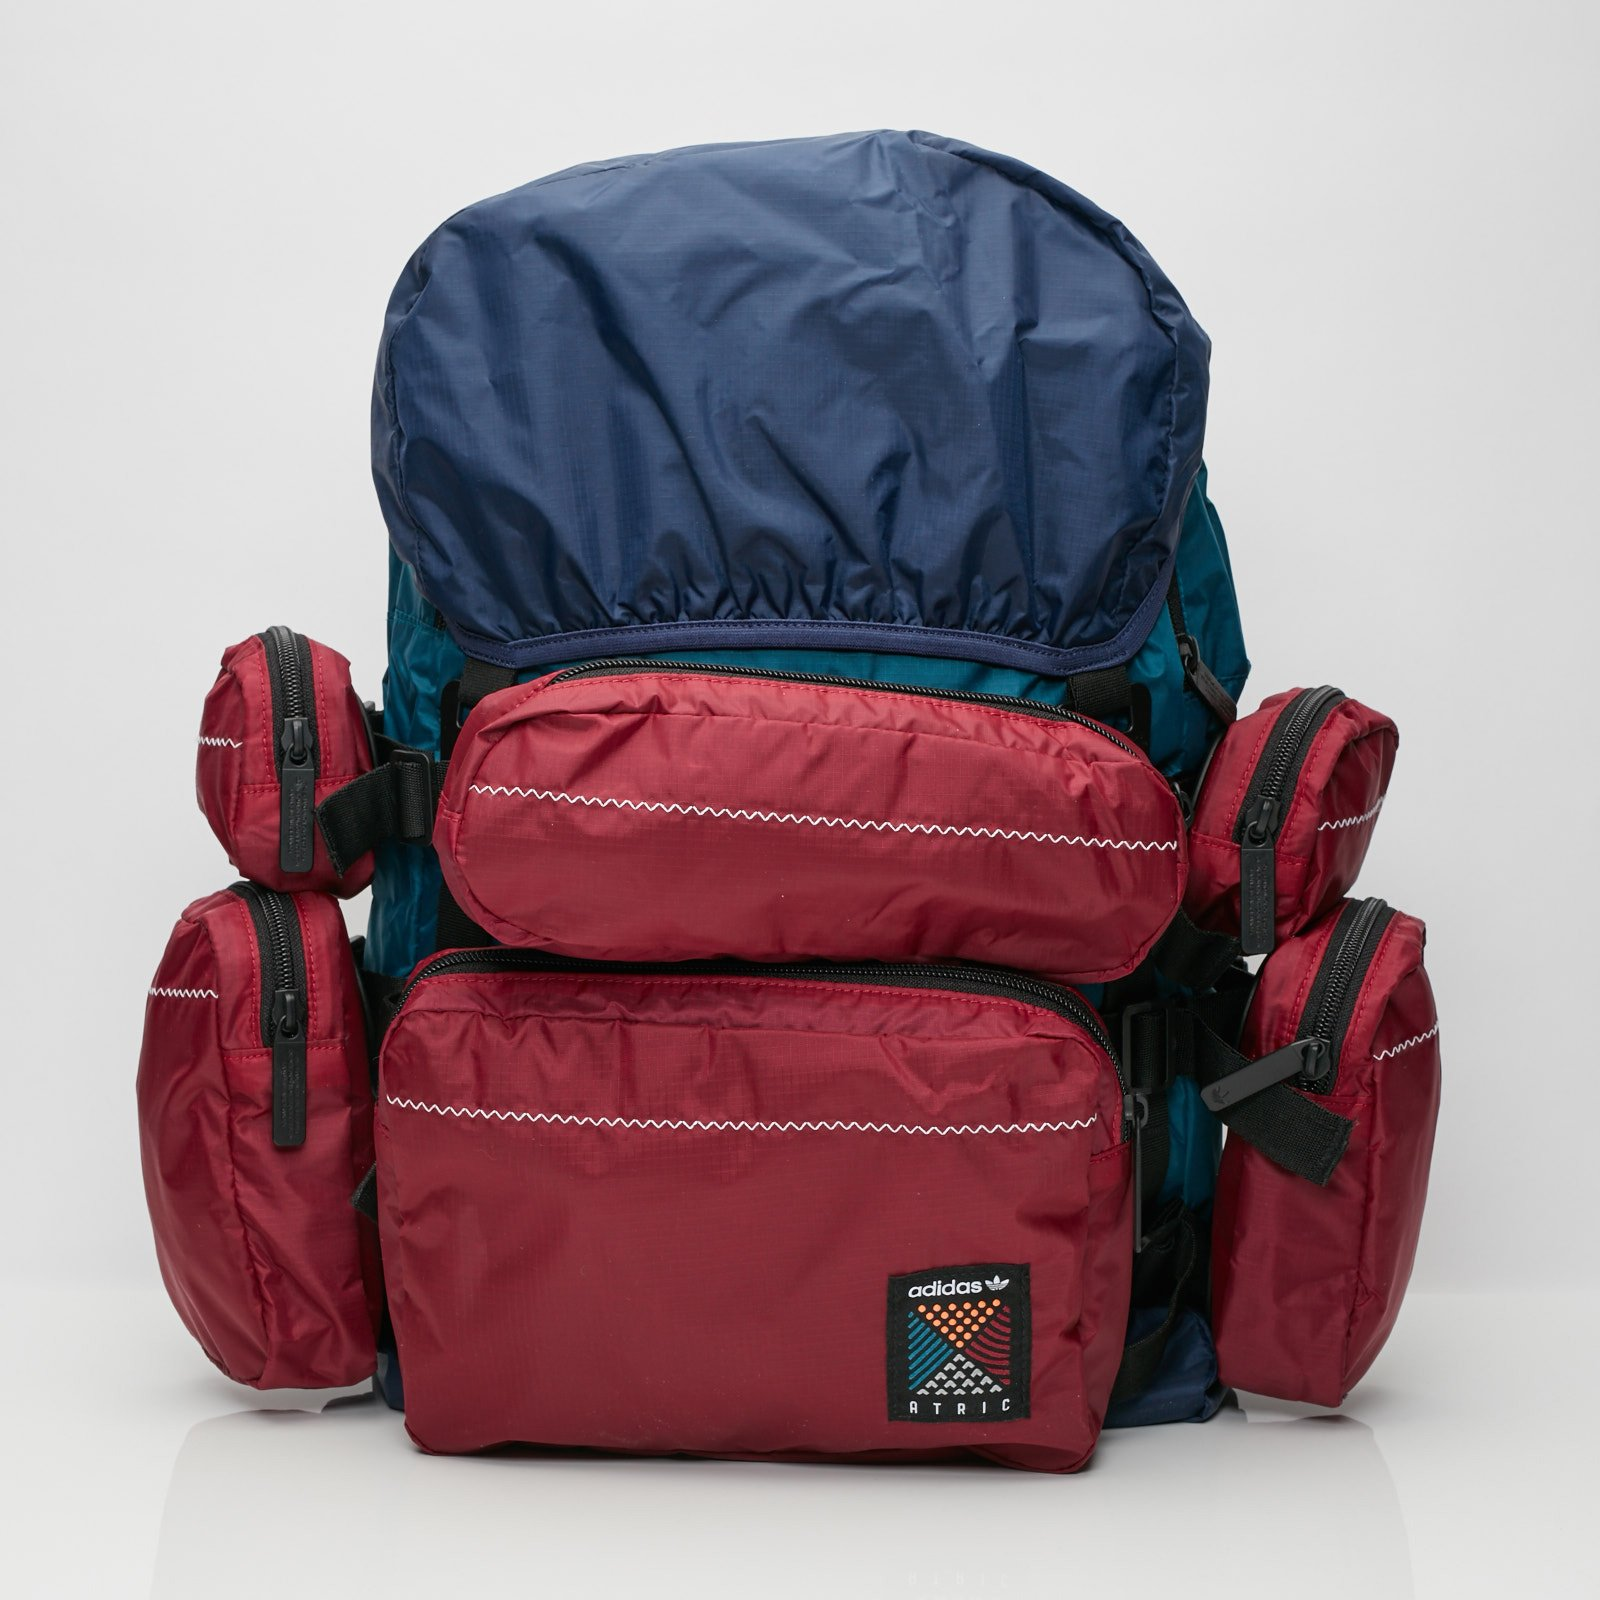 d2014ea473bcaa adidas Backpack - Ce2372 - Sneakersnstuff